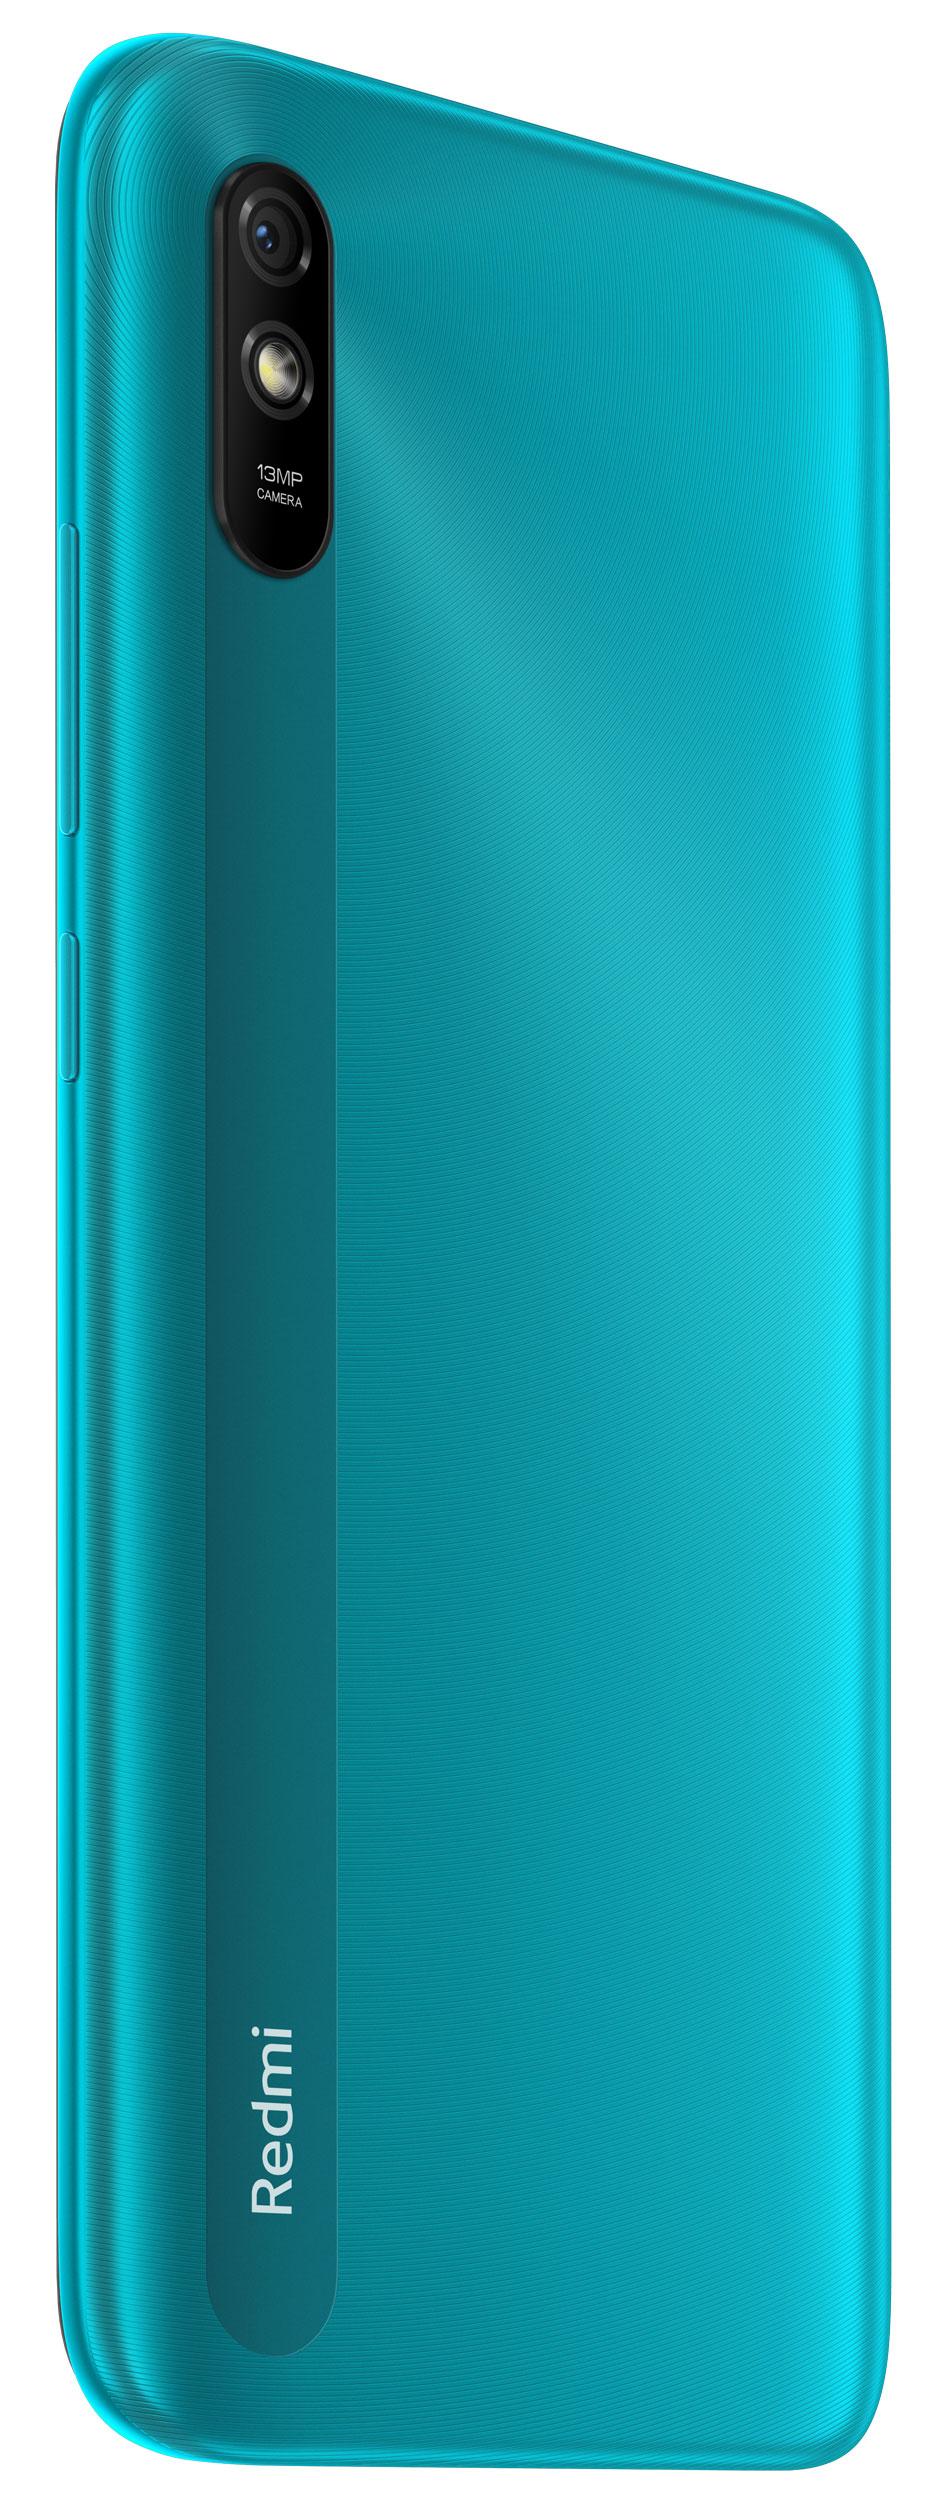 Redmi 9A okostelefon (Global) - 2+32GB, Peacock Green